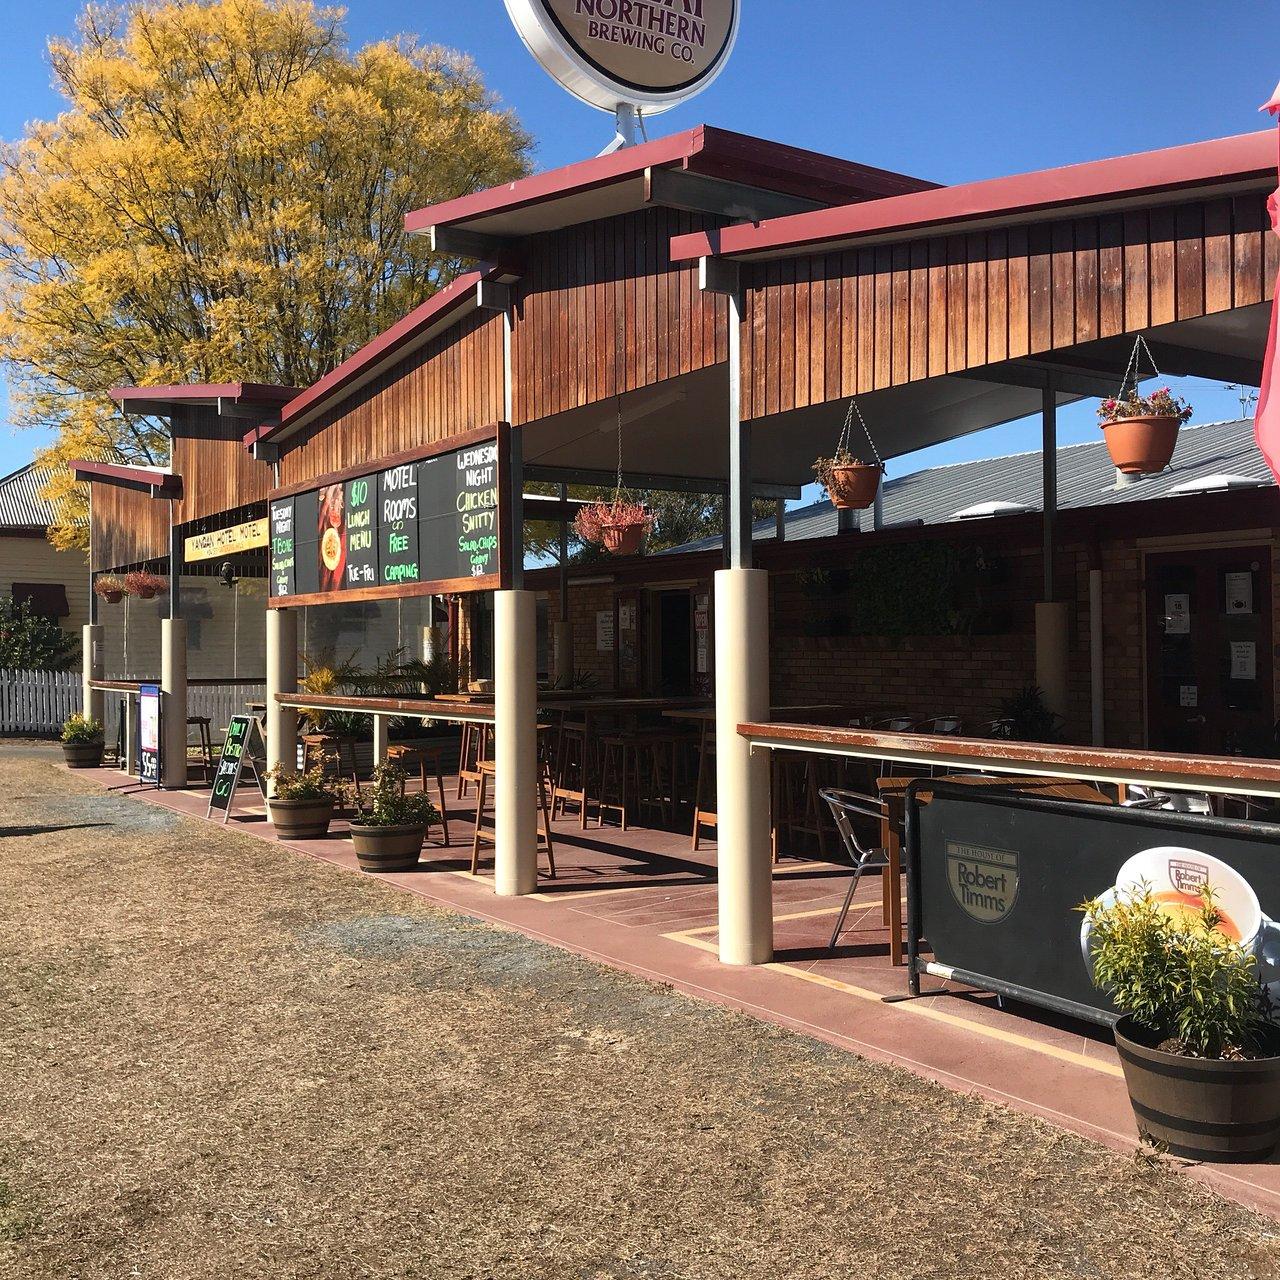 Map Australia 4371.Yangan Hotel Motel 2018 Reviews Photos Of Hotel Tripadvisor